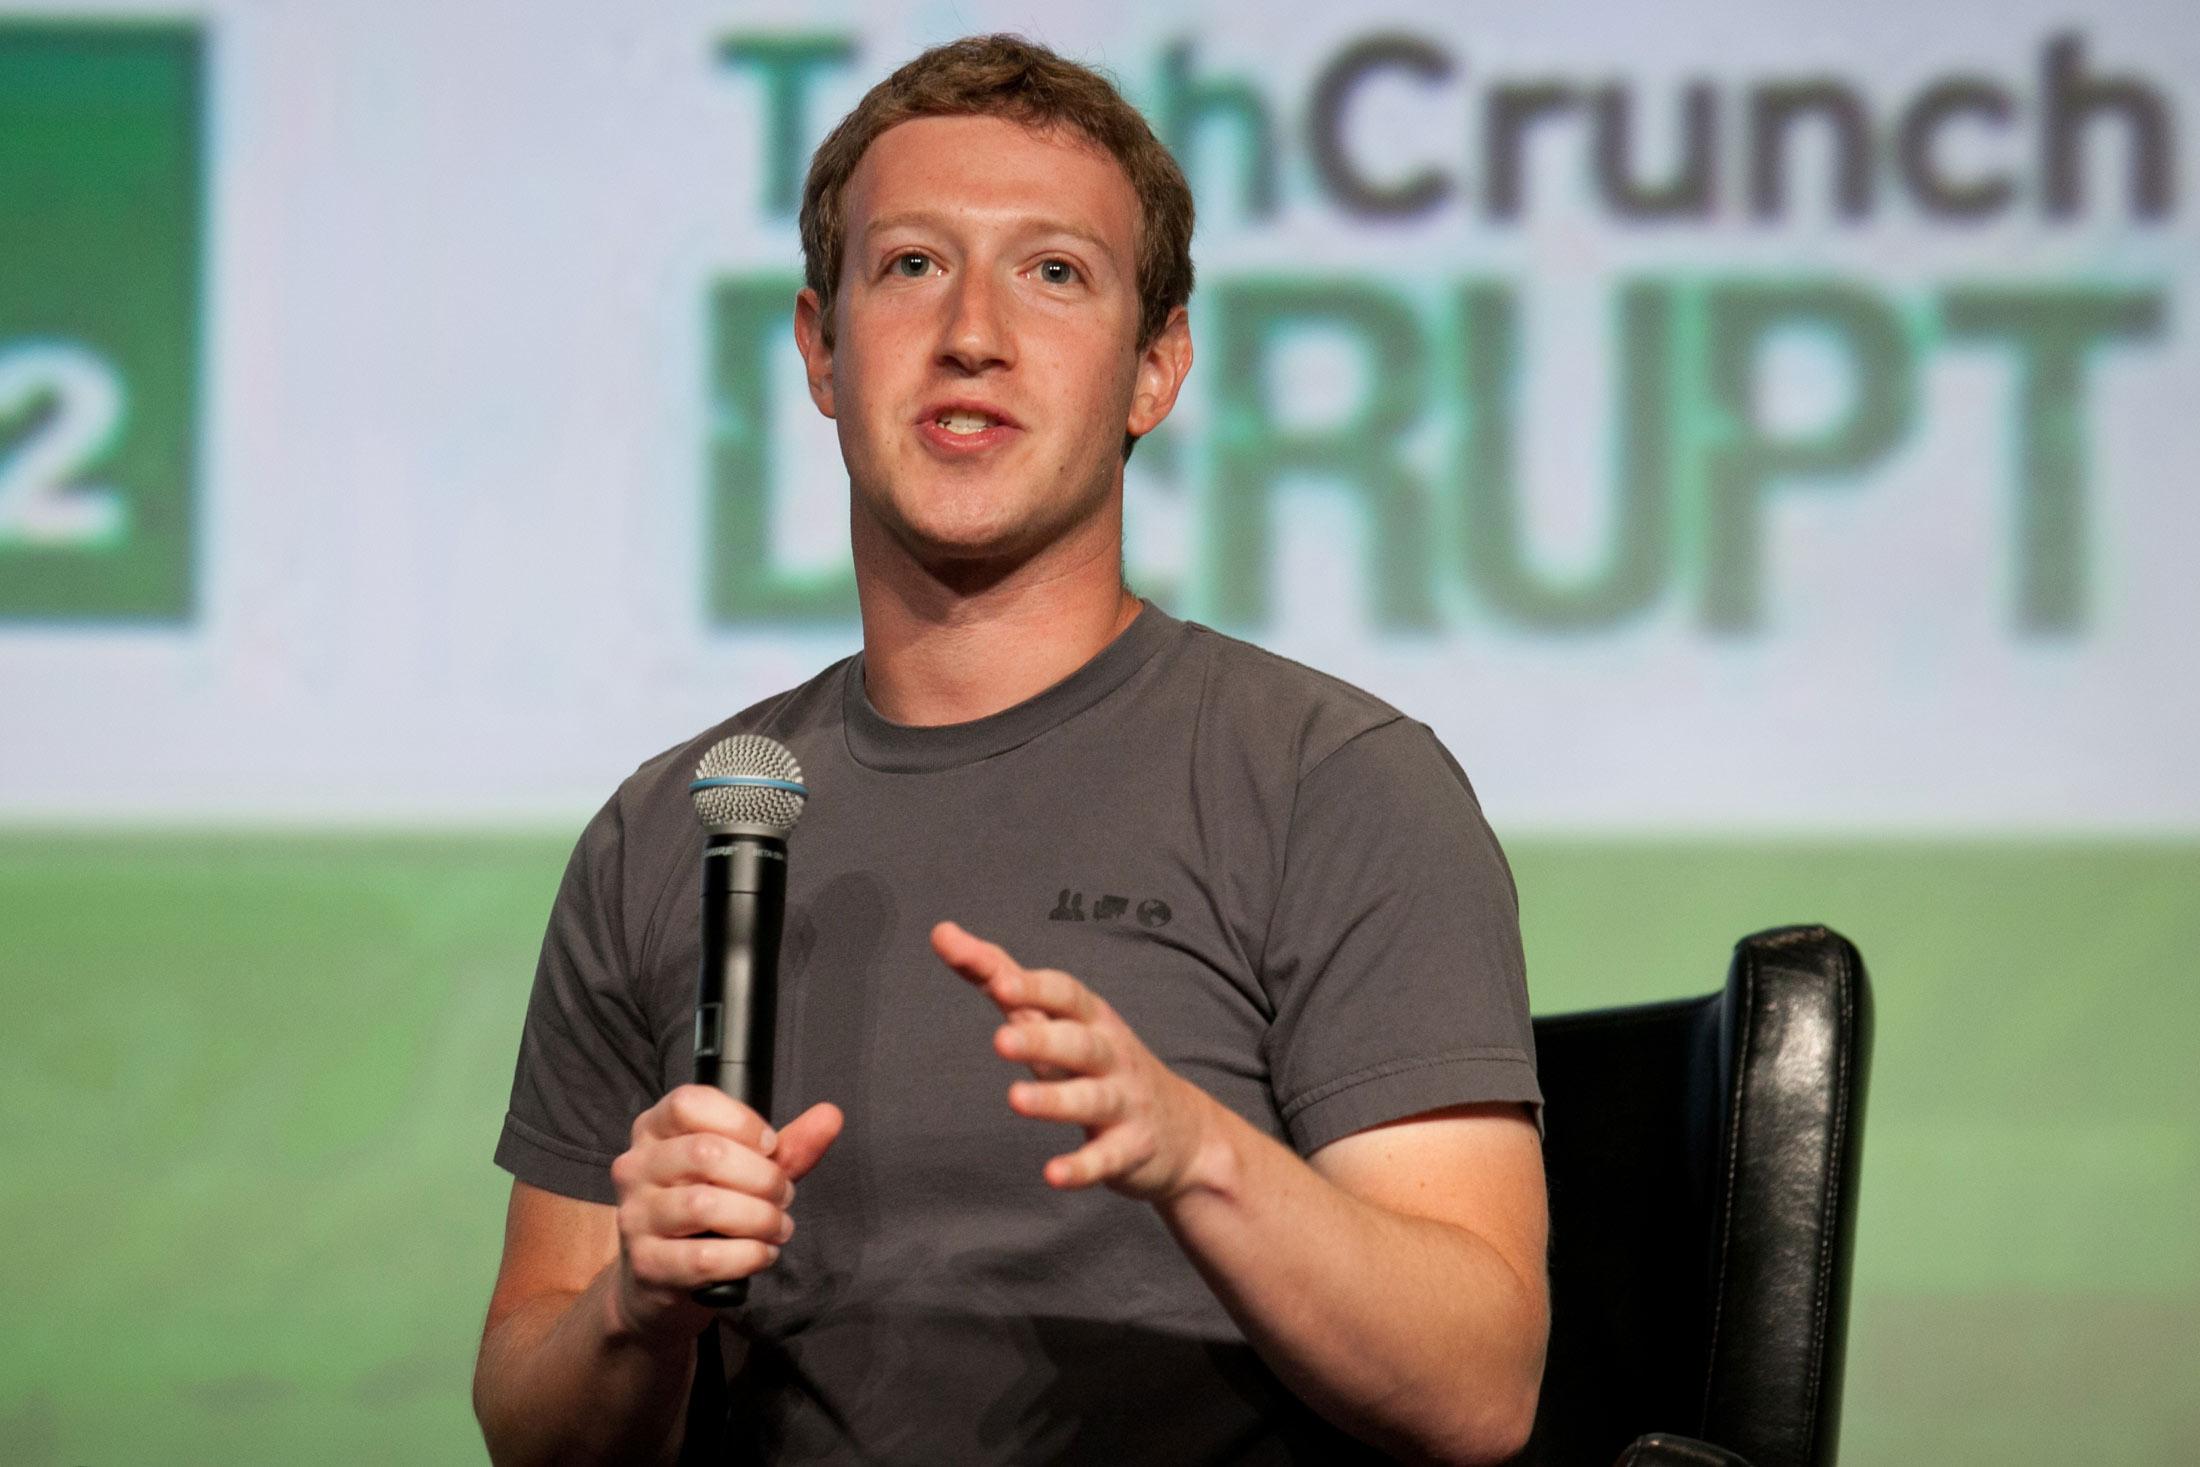 Facebook CEO Mark Zuckerberg at TechCrunch Disrupt 2012.